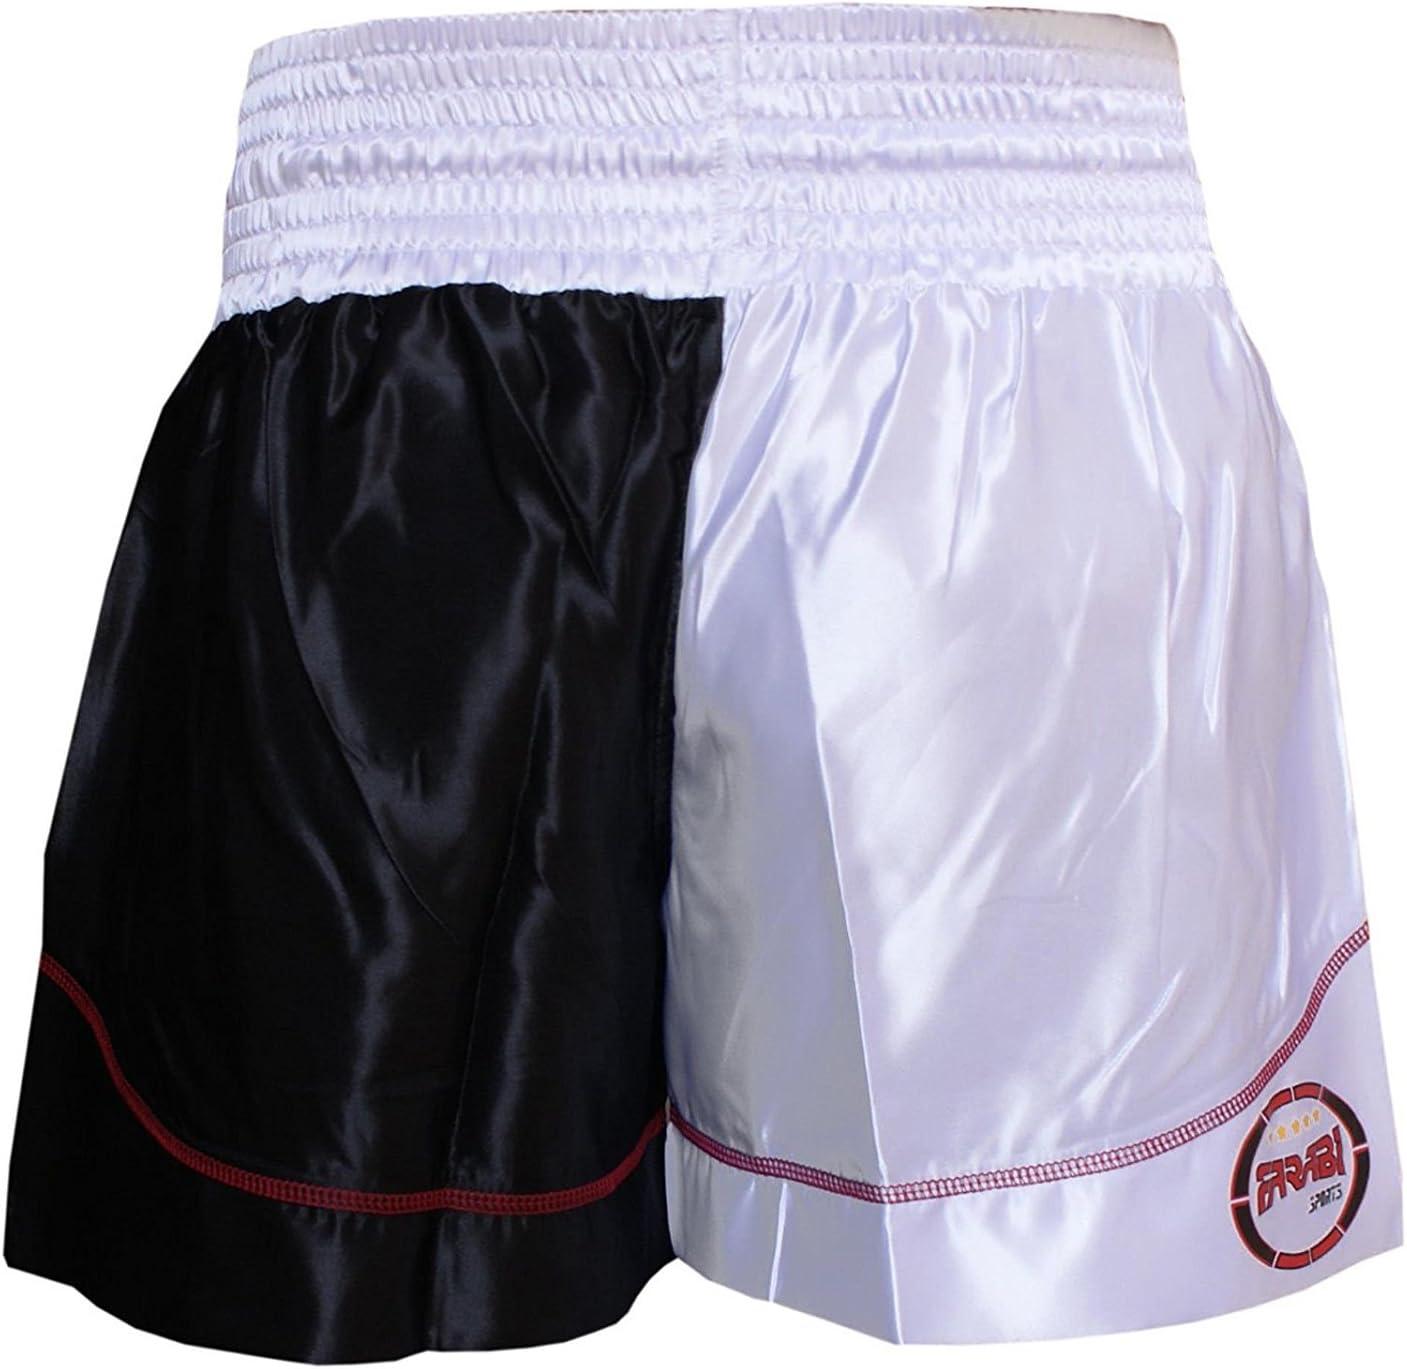 Farabi Muay Thai MMA Kickboxing Cage Fighting Training and Professional Fighting Shorts Trunks